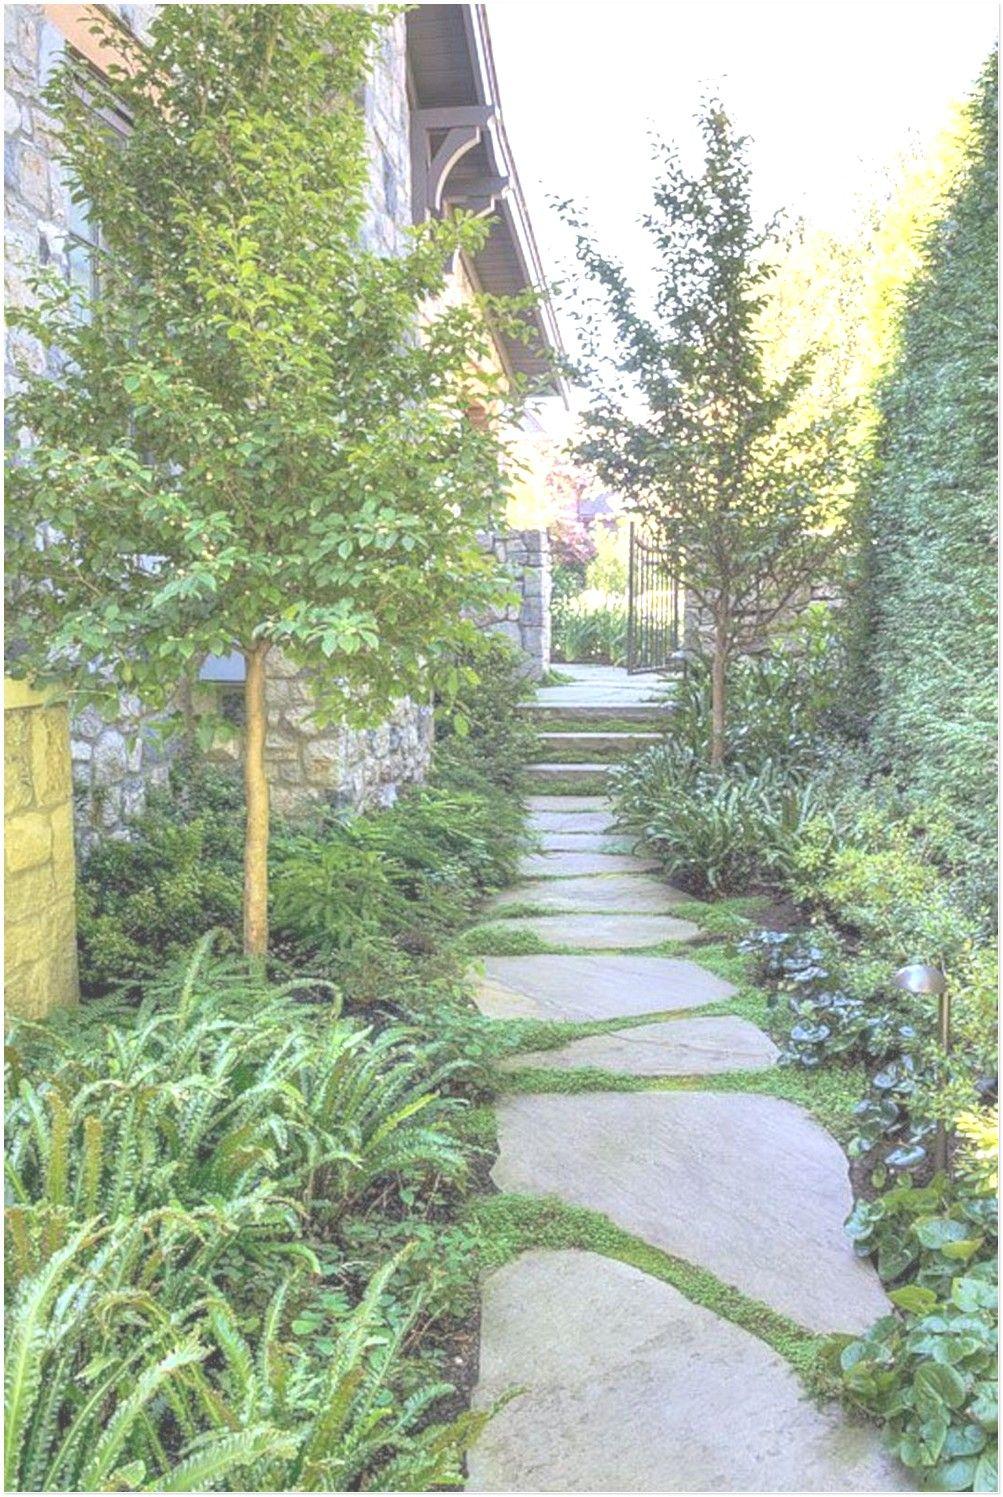 86 Images Of Beautiful Backyard Landscaping Ideas That So Inspiring In 2020 Side Yard Landscaping Walkway Landscaping Narrow Garden